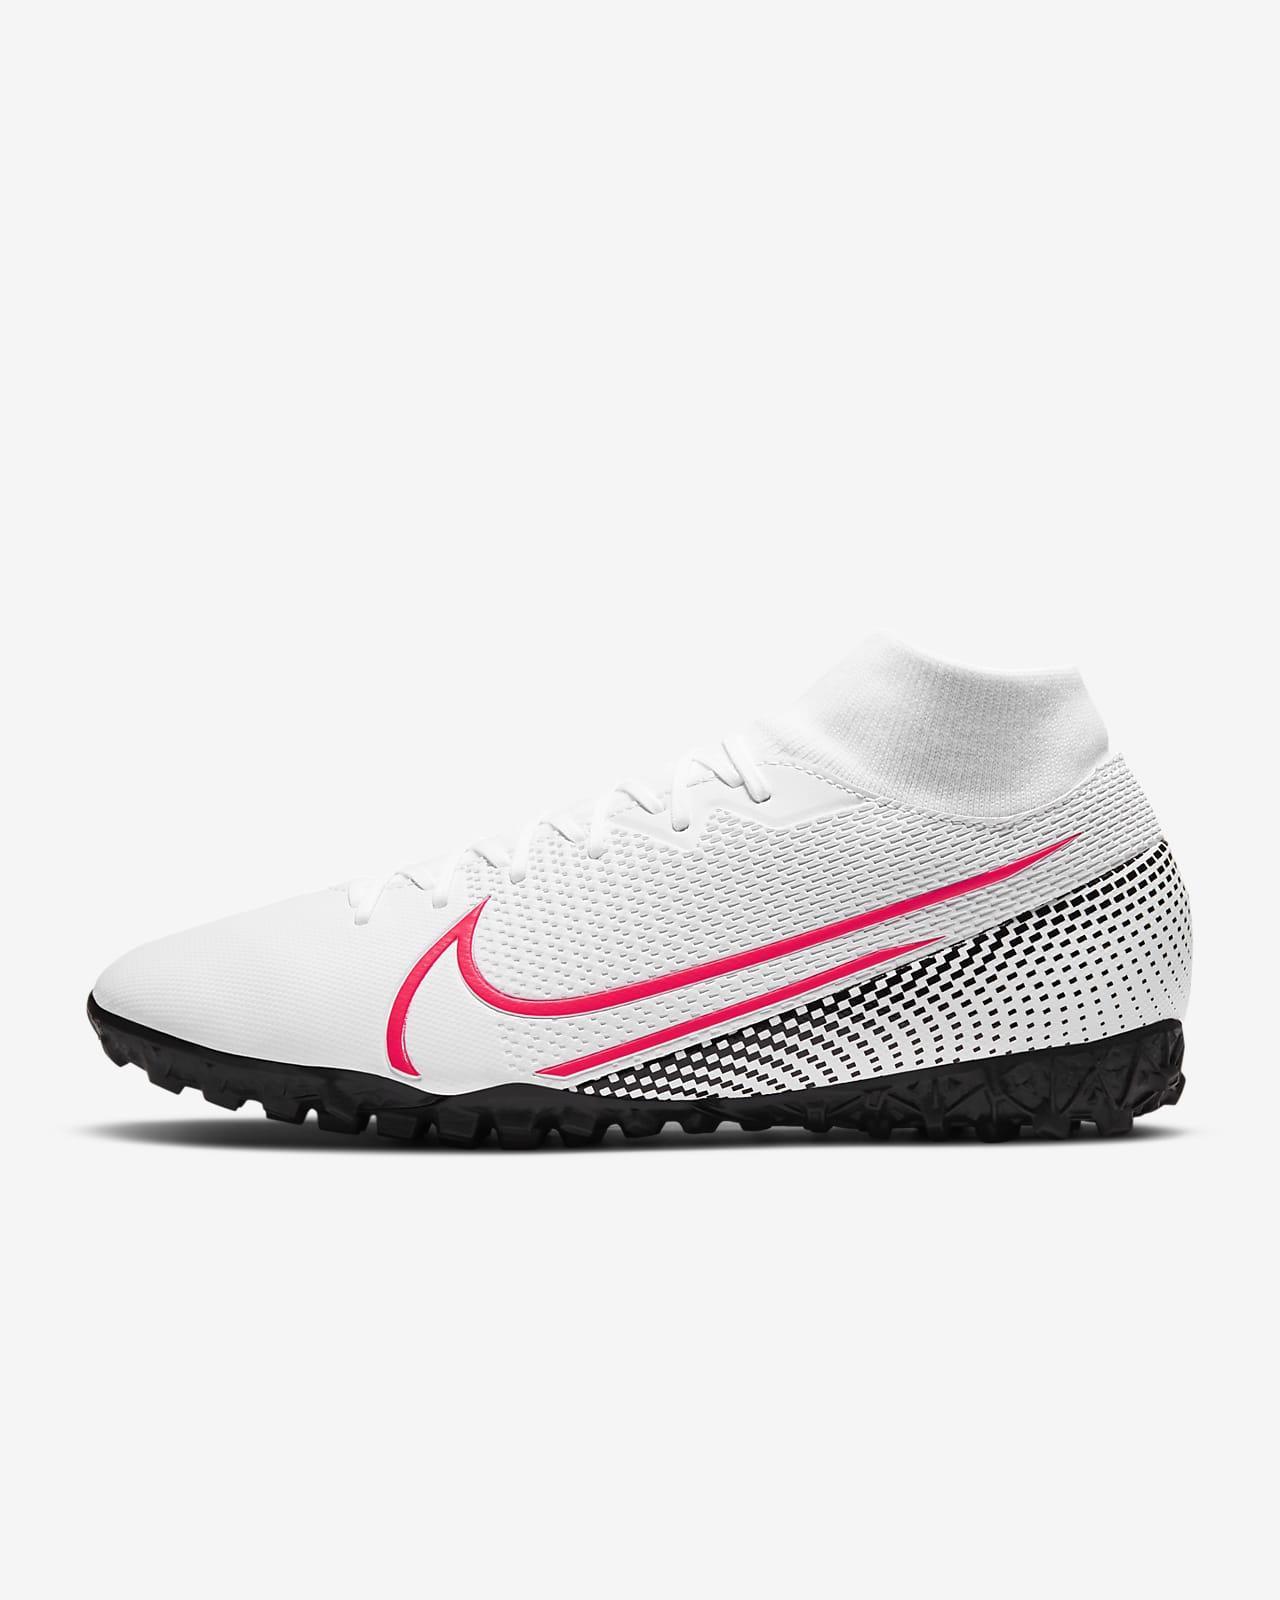 Nike Mercurial Superfly 7 Academy TF Artificial-Turf Football Shoe